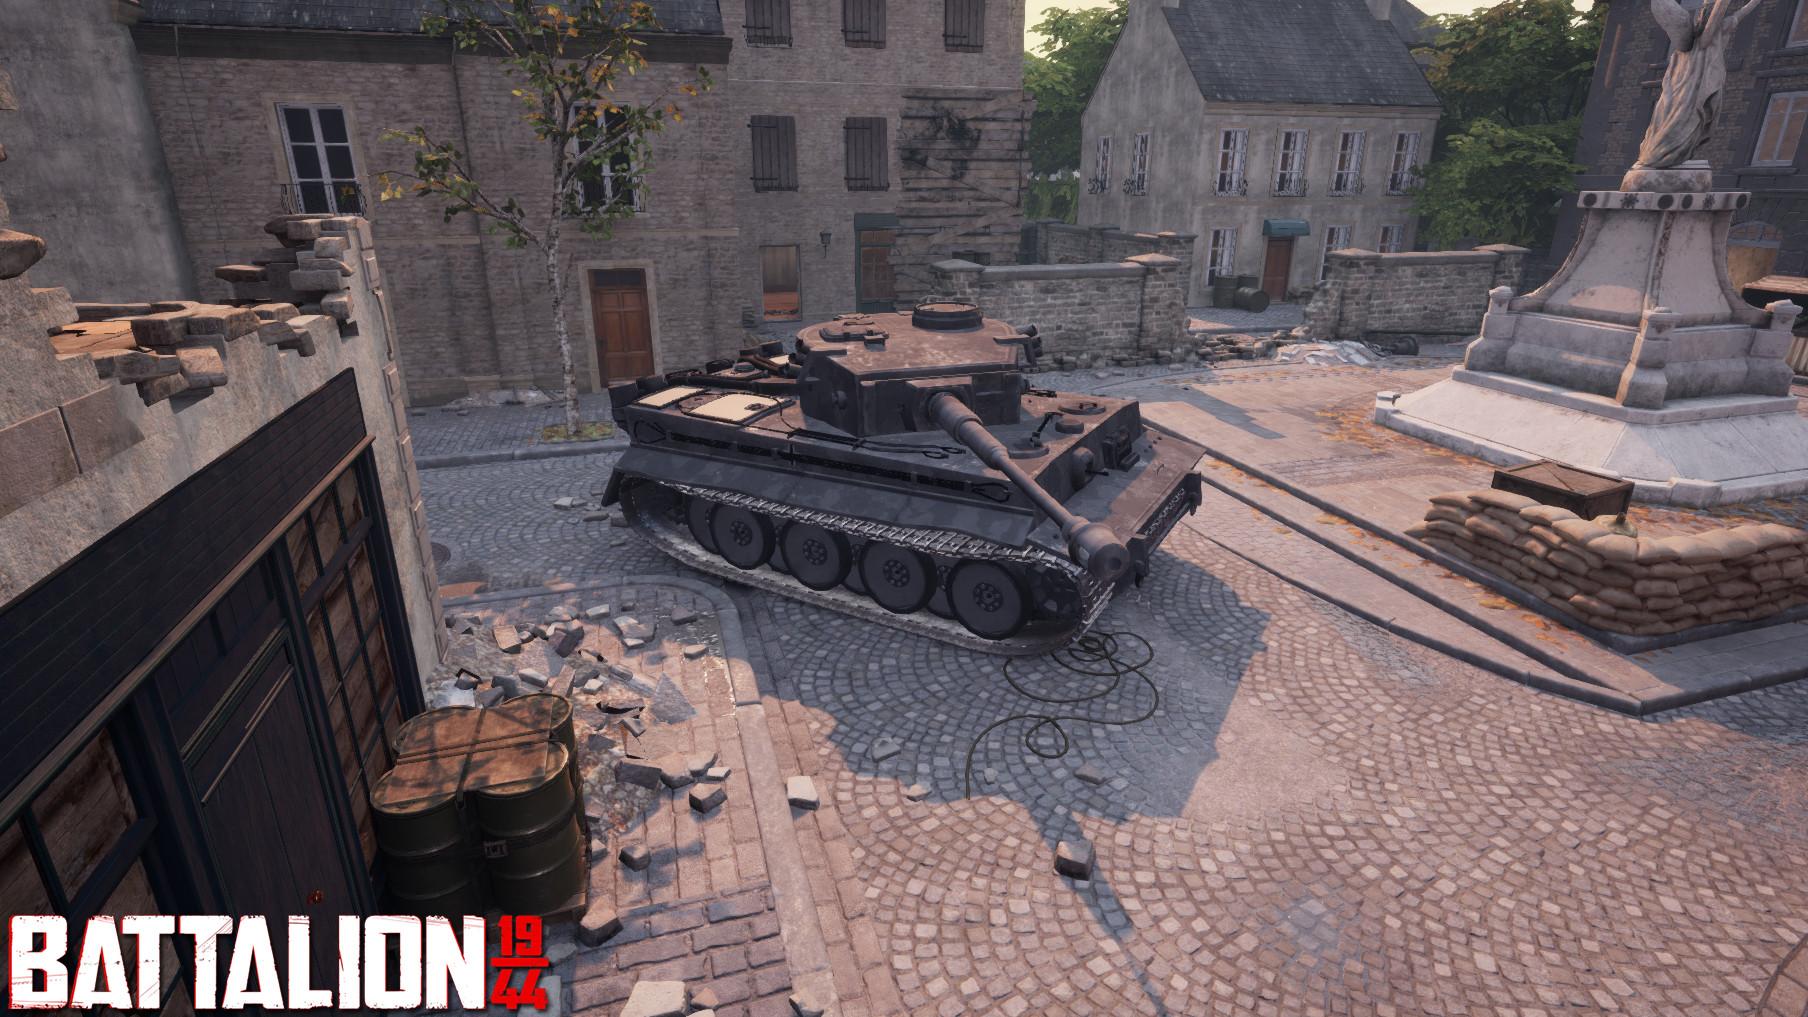 Jordan younie battalion 1944 screenshot 2018 02 25 18 50 25 19